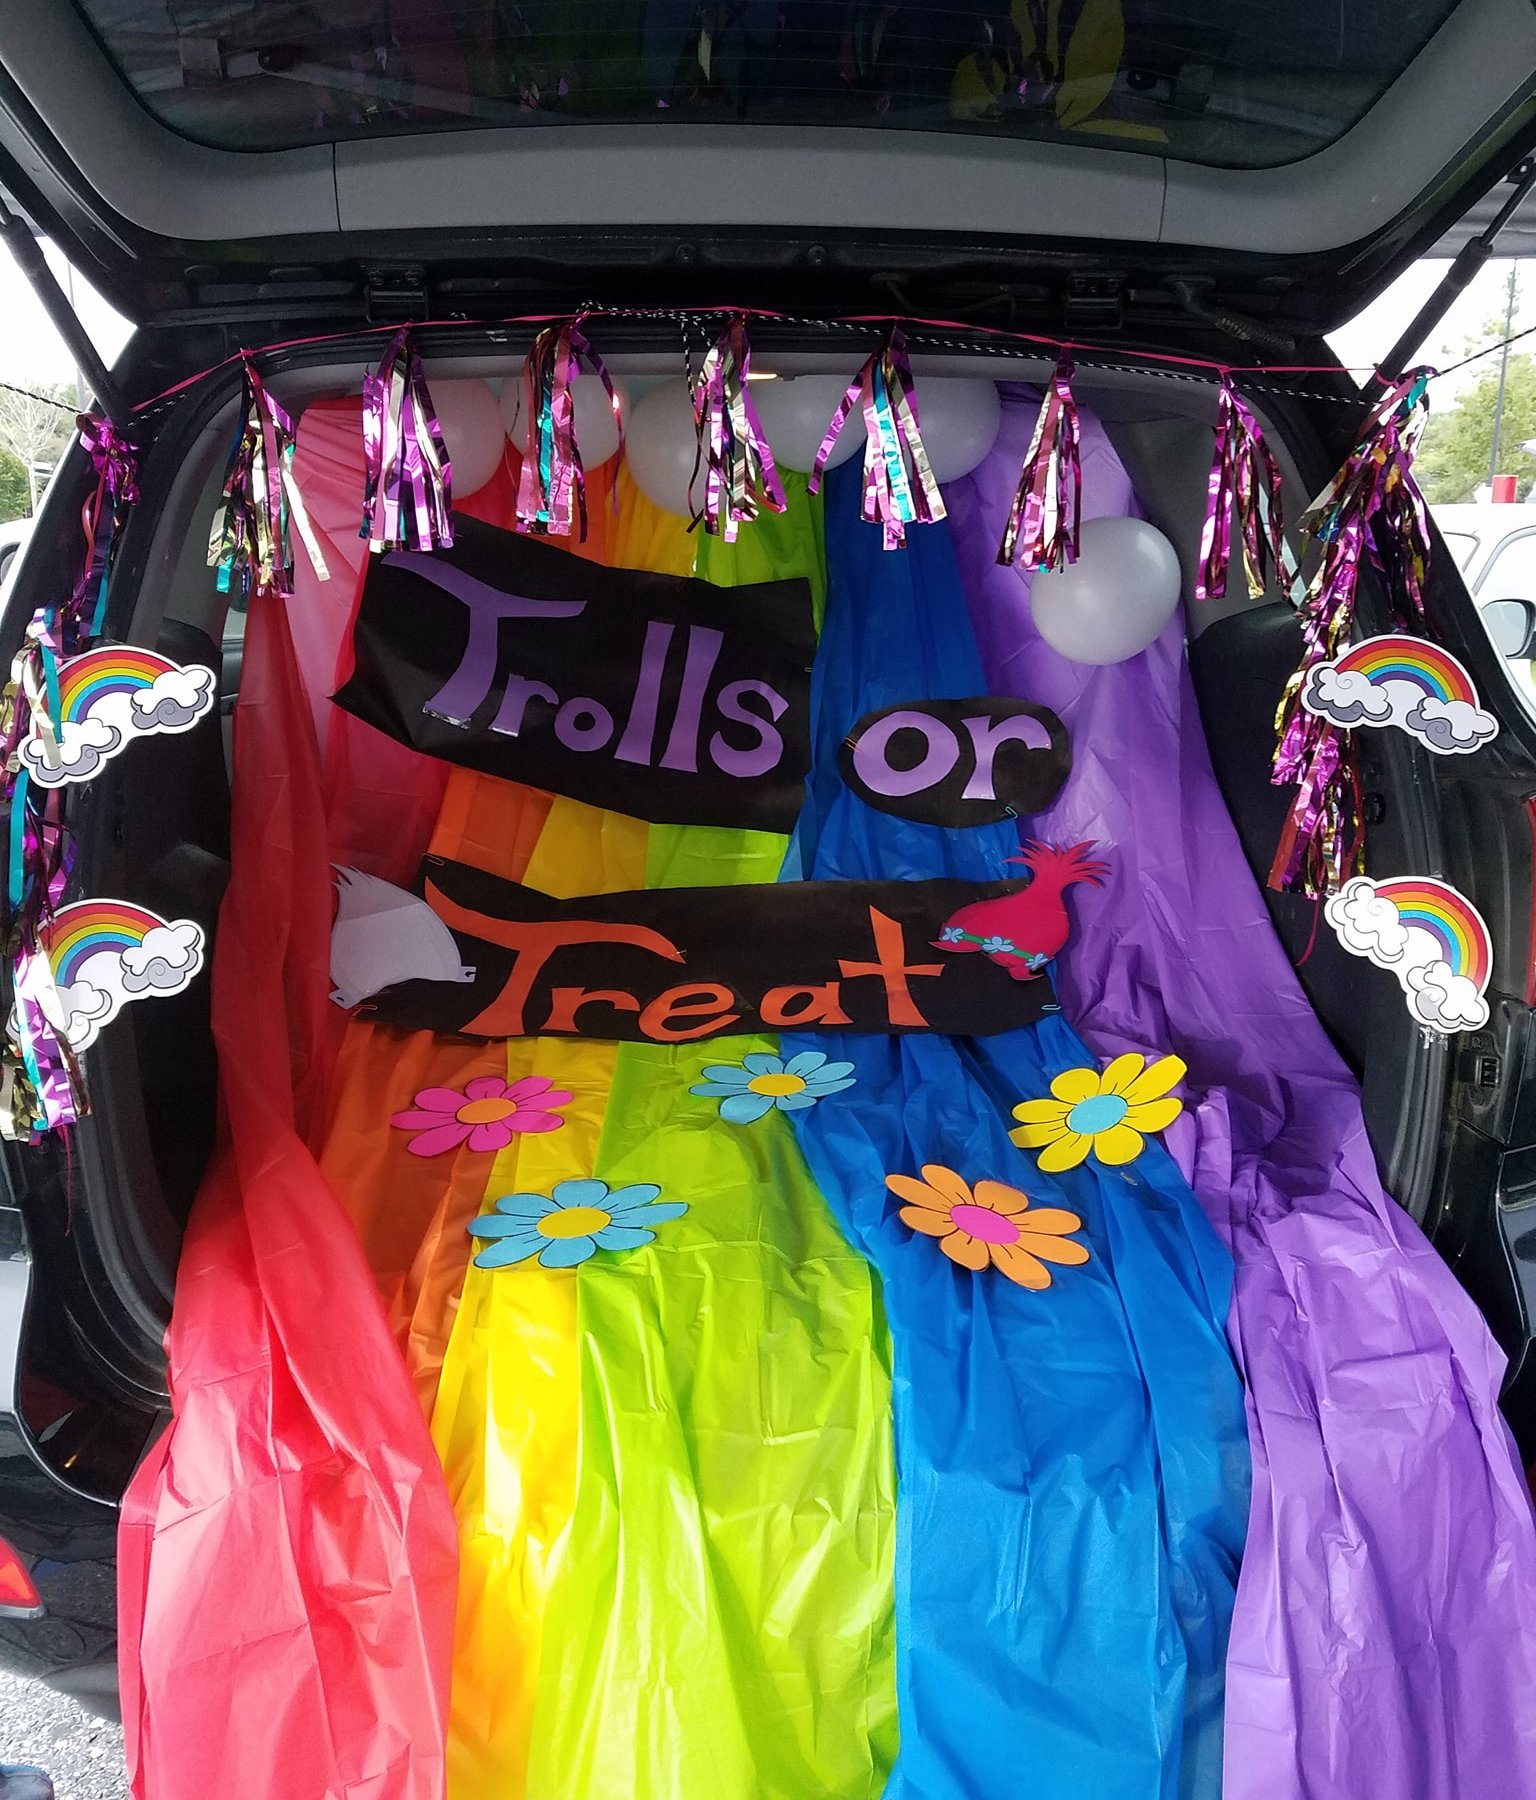 trolls trunk or treat set up